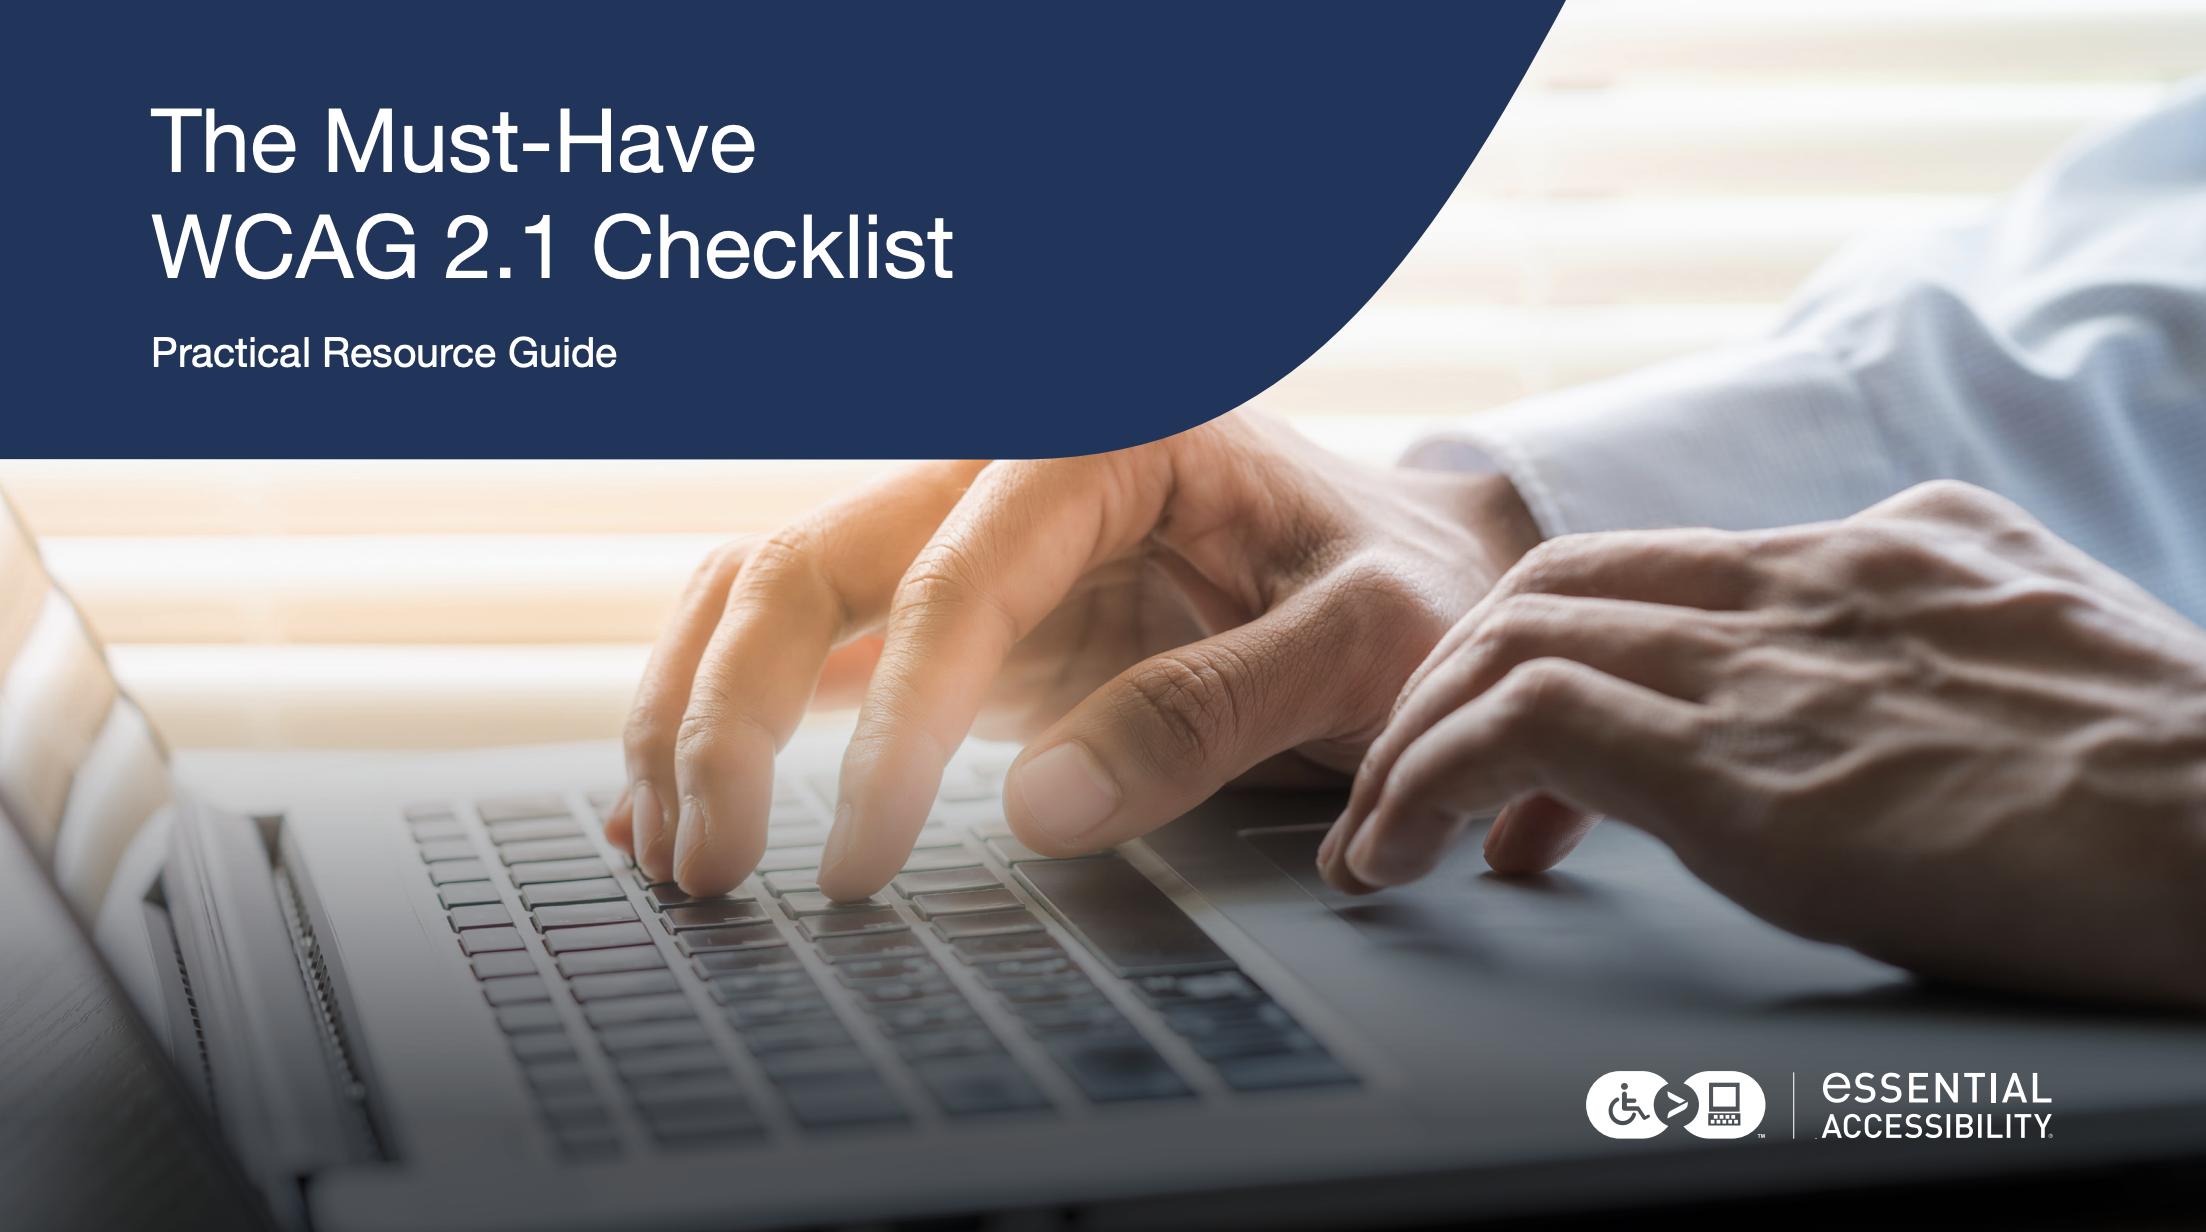 Essential-Accessibility-WCAG-2.1-Checklist